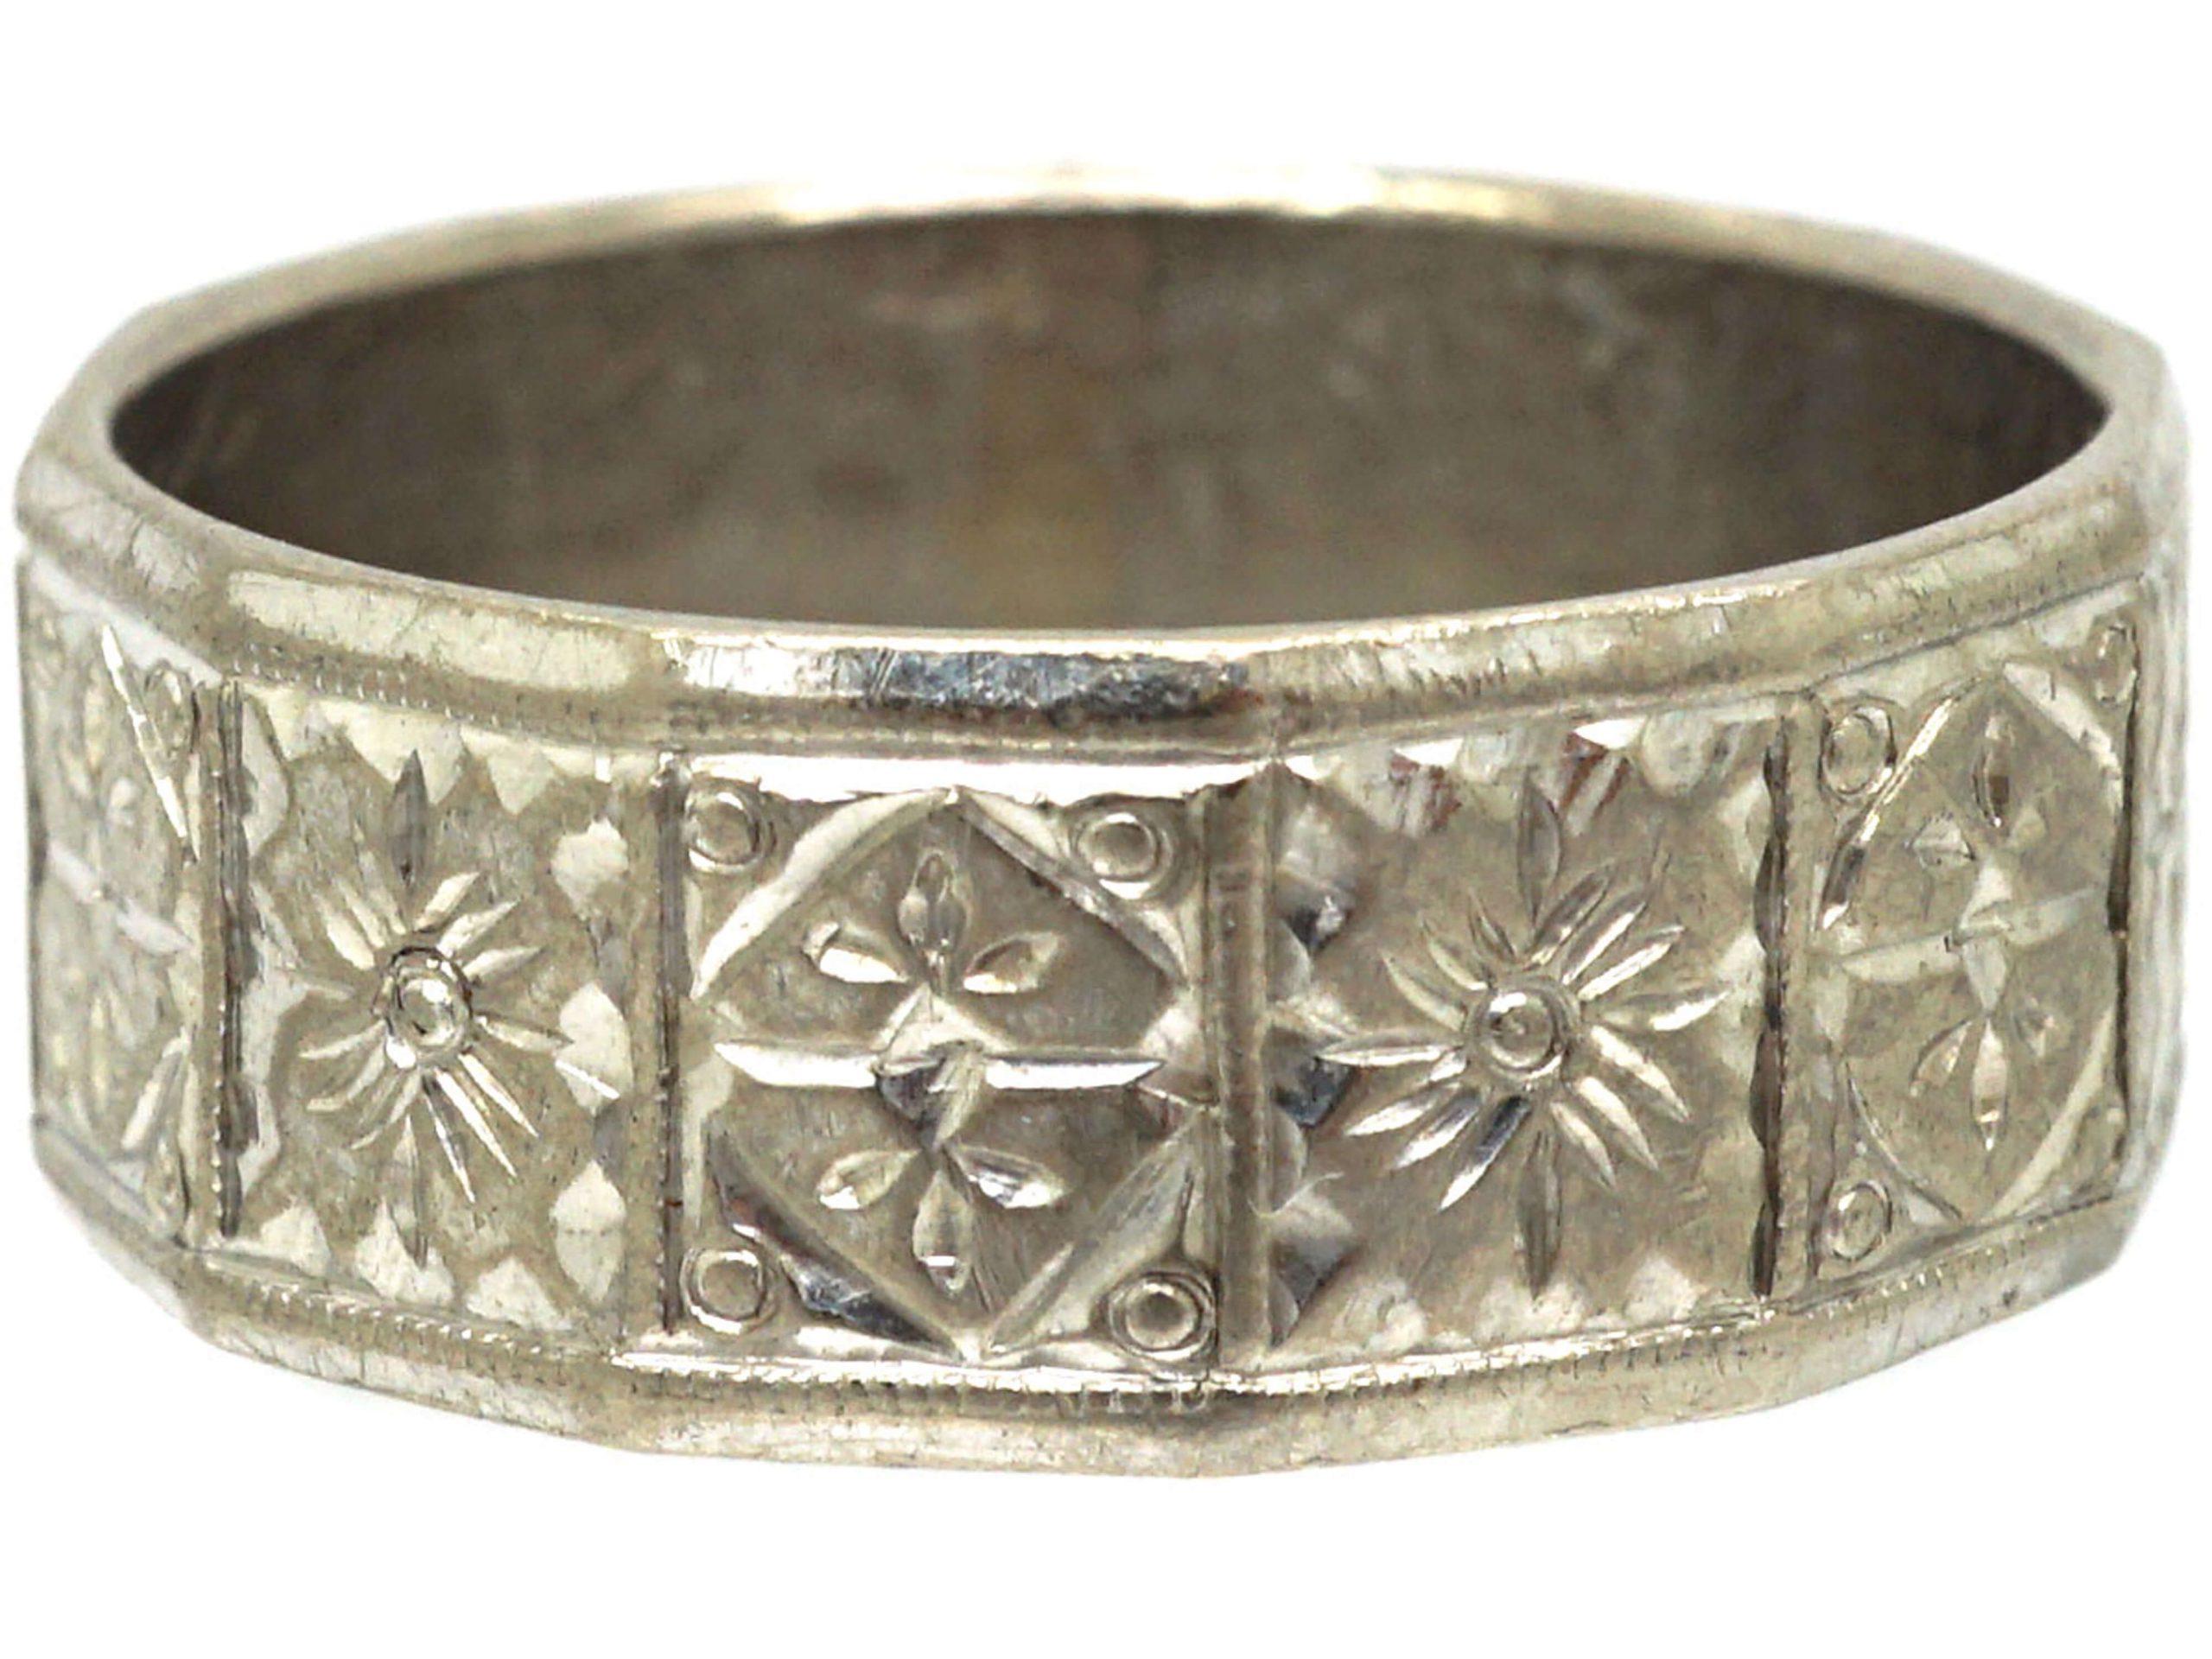 18ct White Gold Wide Wedding Ring with Flower & Diamond Motifs